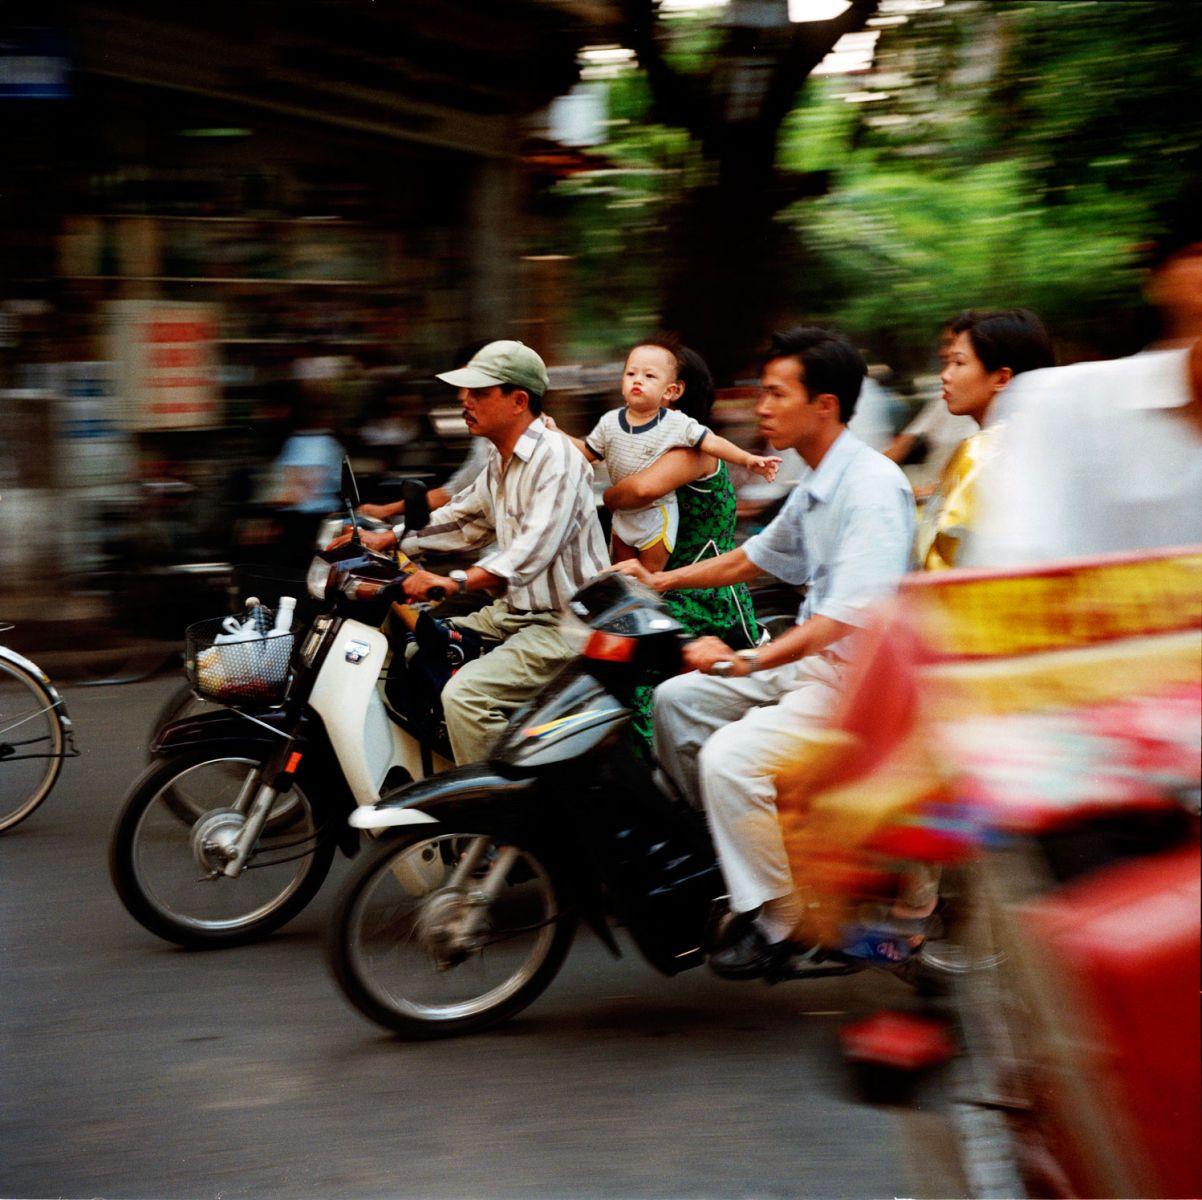 1baby_on_motorbike.jpg